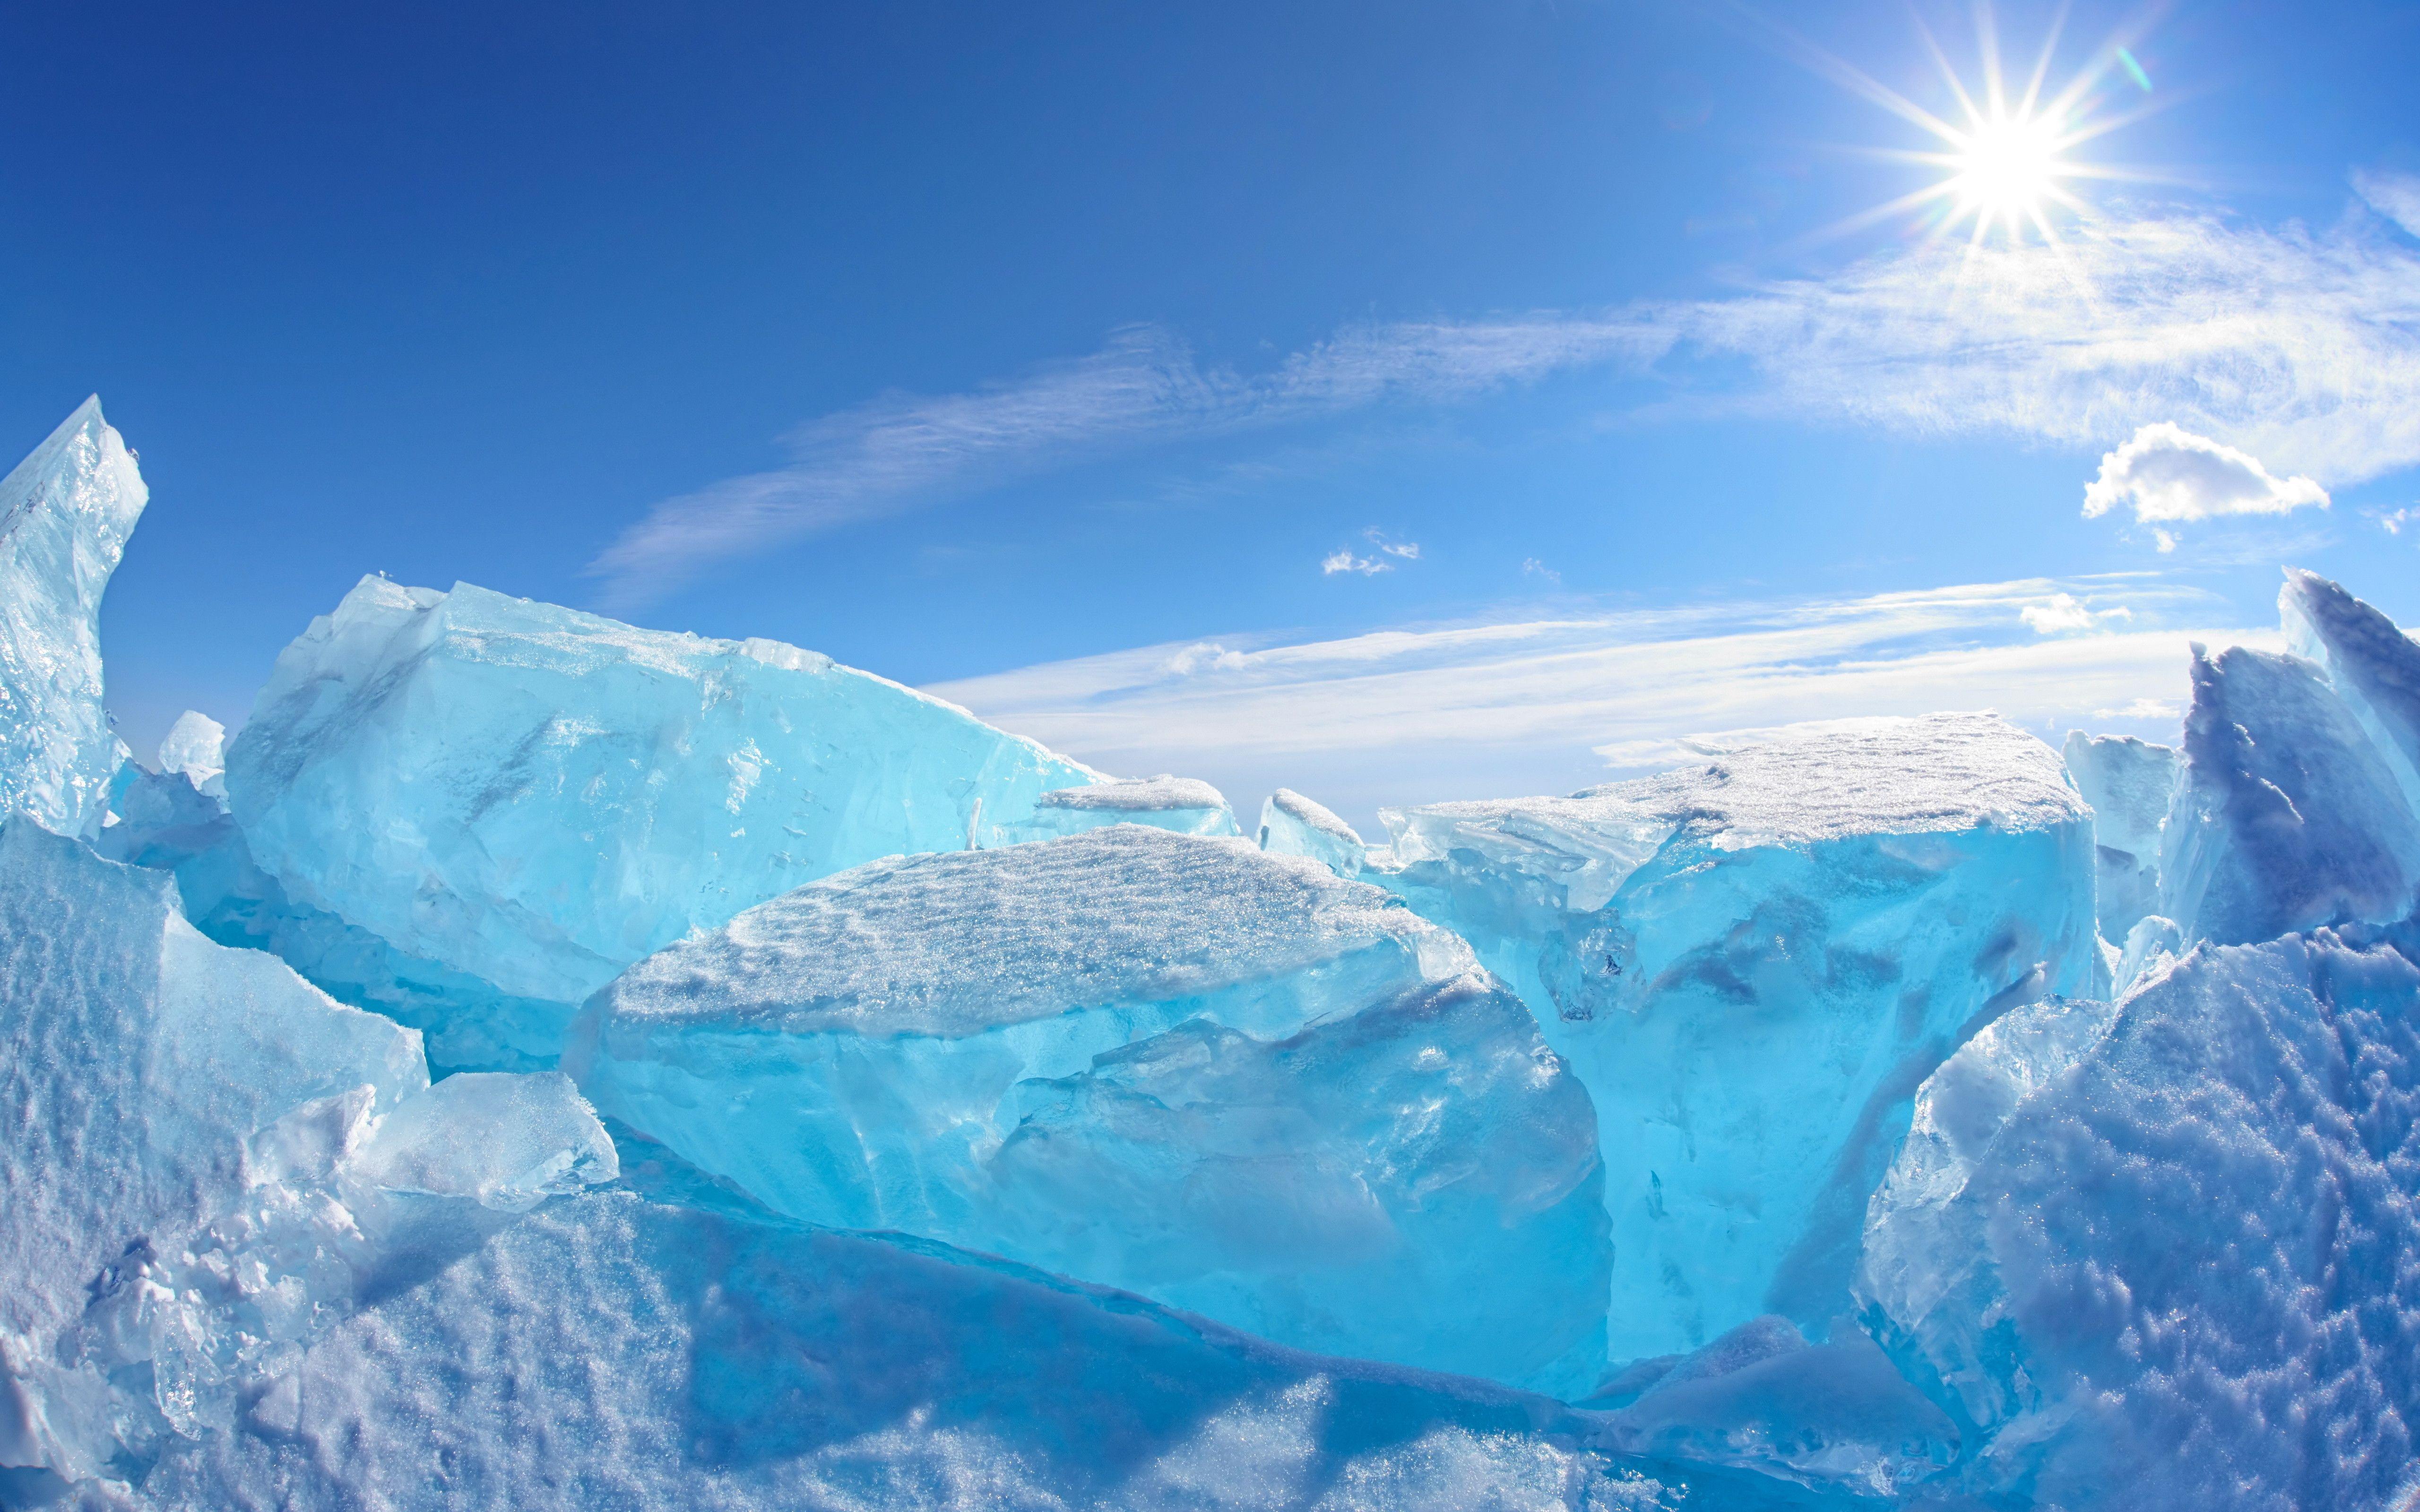 Wallpaper Download 5120x3200 Lake Baikal Siberia Hd